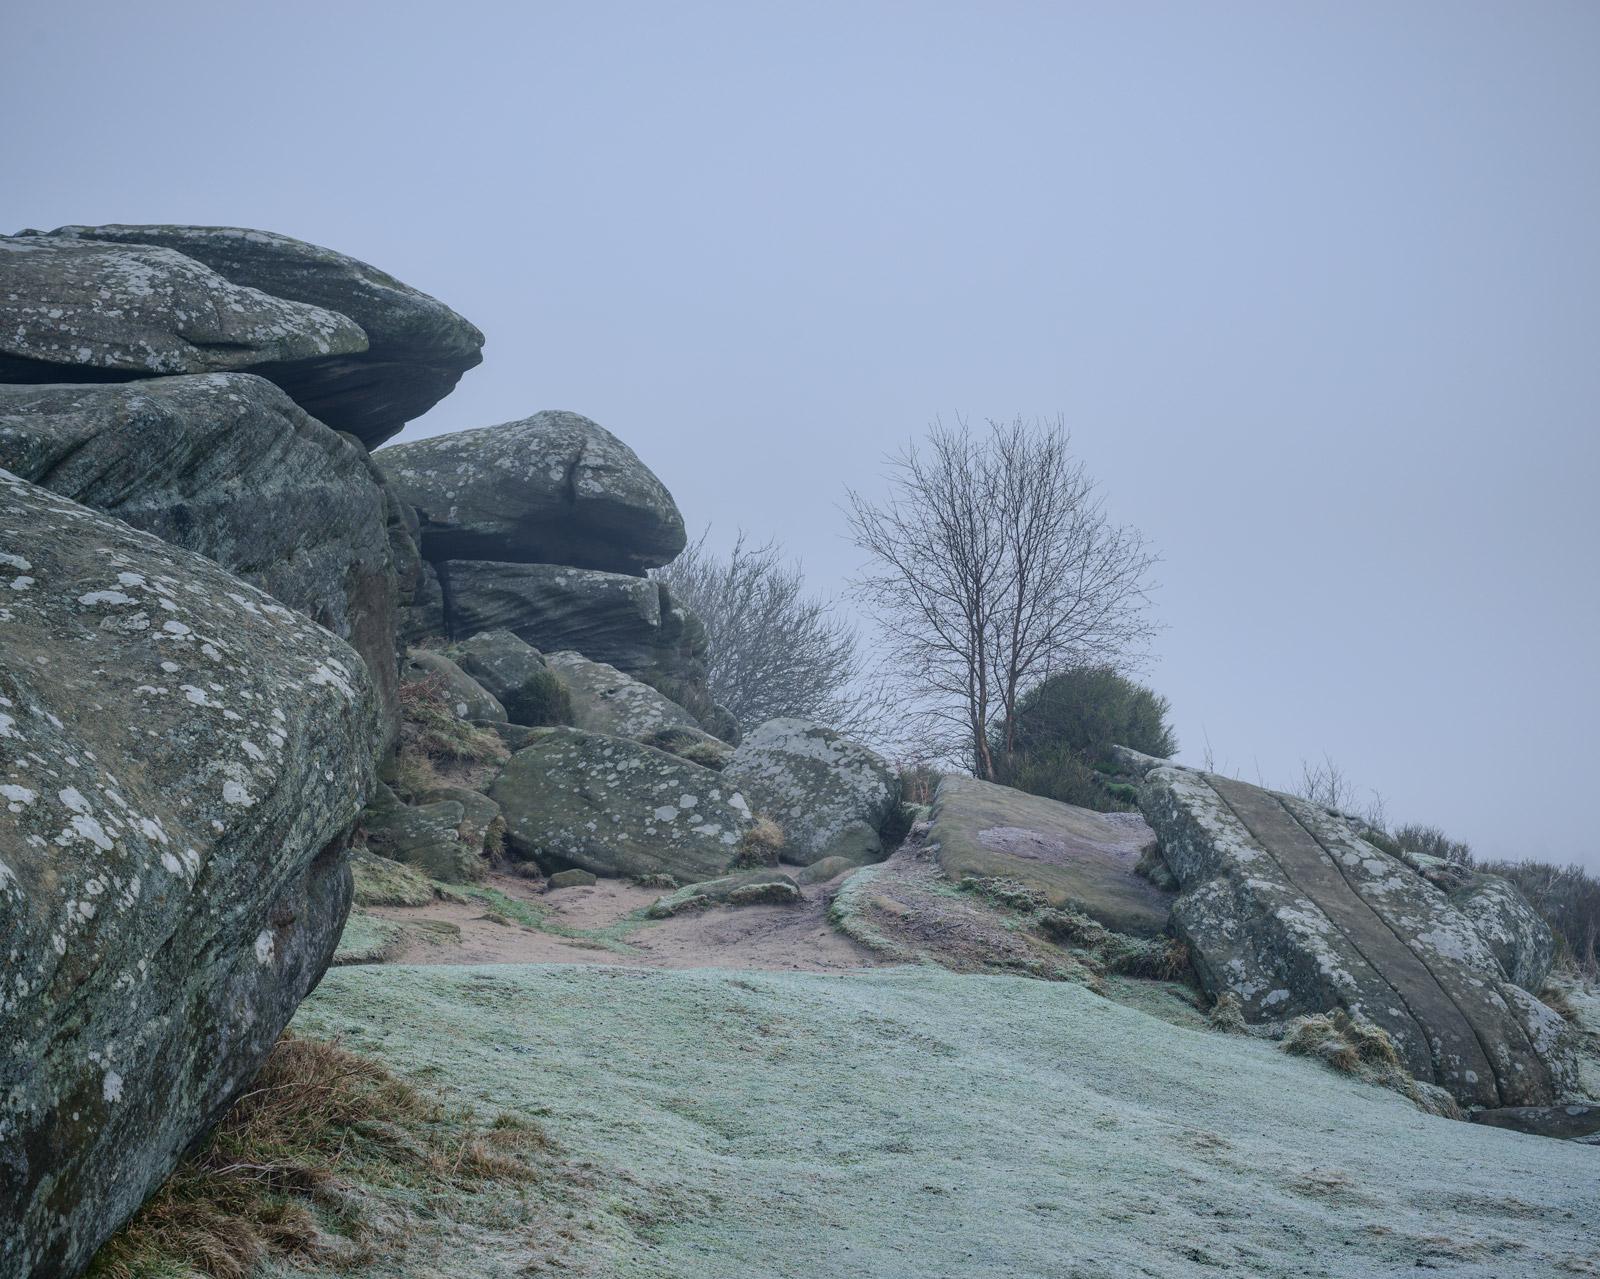 Striped boulder, Brimham Rocks - Nikon 50mm at f/8